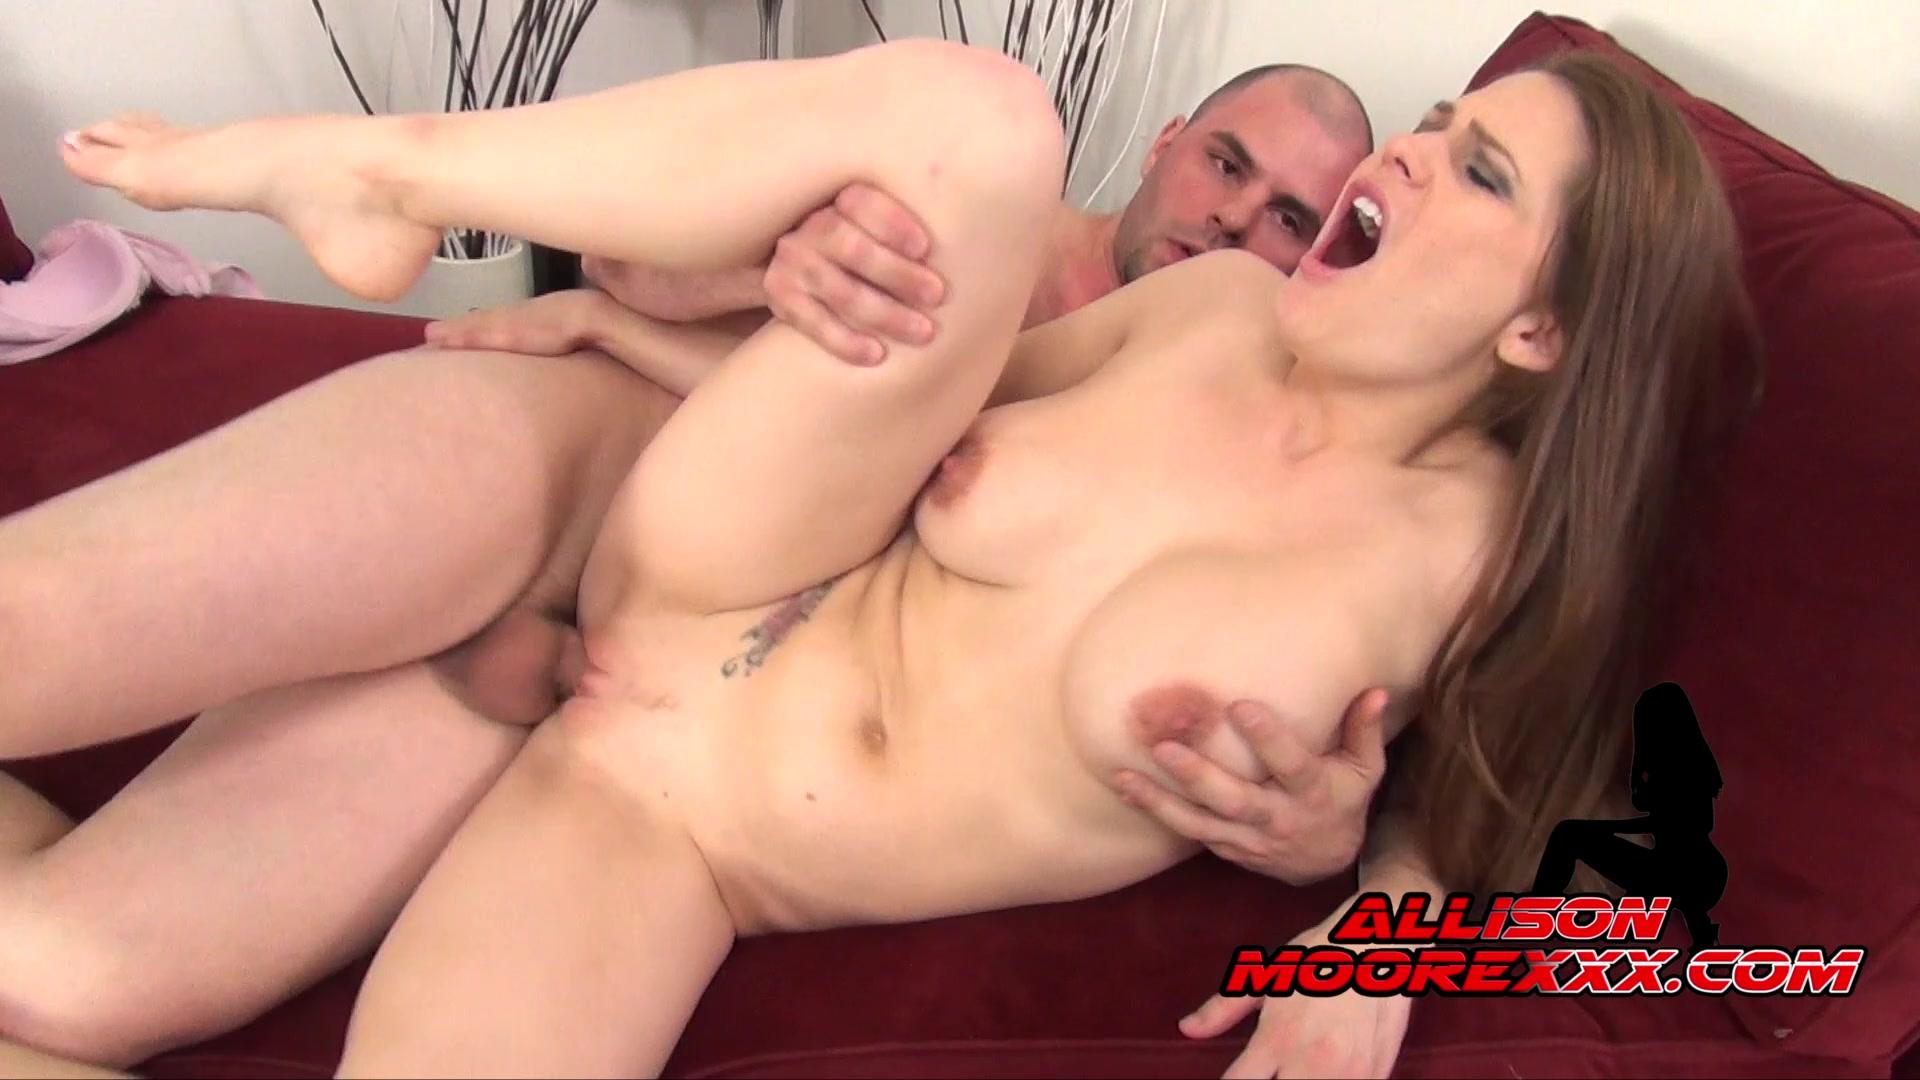 Allison Moore  Ralph Long Videos On Demand  Adult DVD Empire